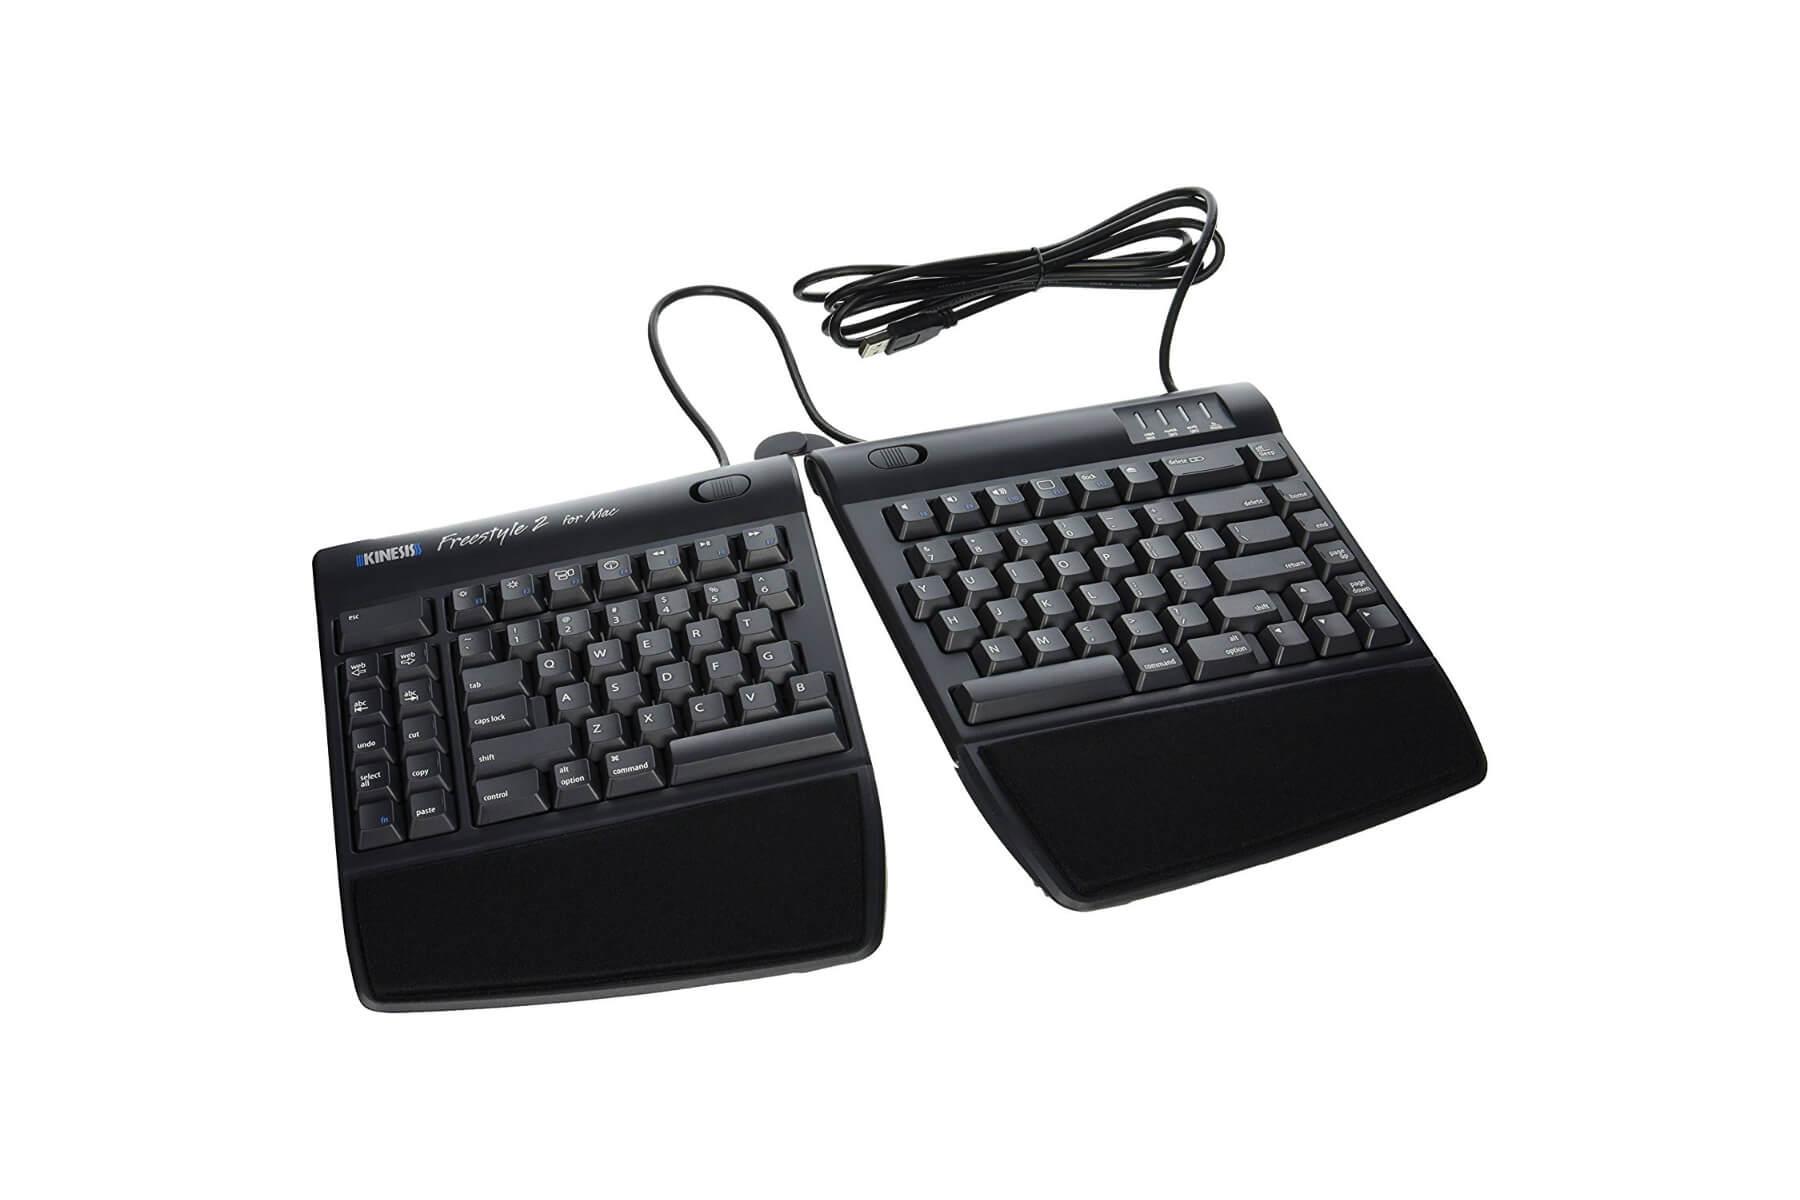 00e1c6cb9cc Kinesis Freestyle2 Keyboard w/ VIP3 Lifters (PC) | Pacific Ergonomics